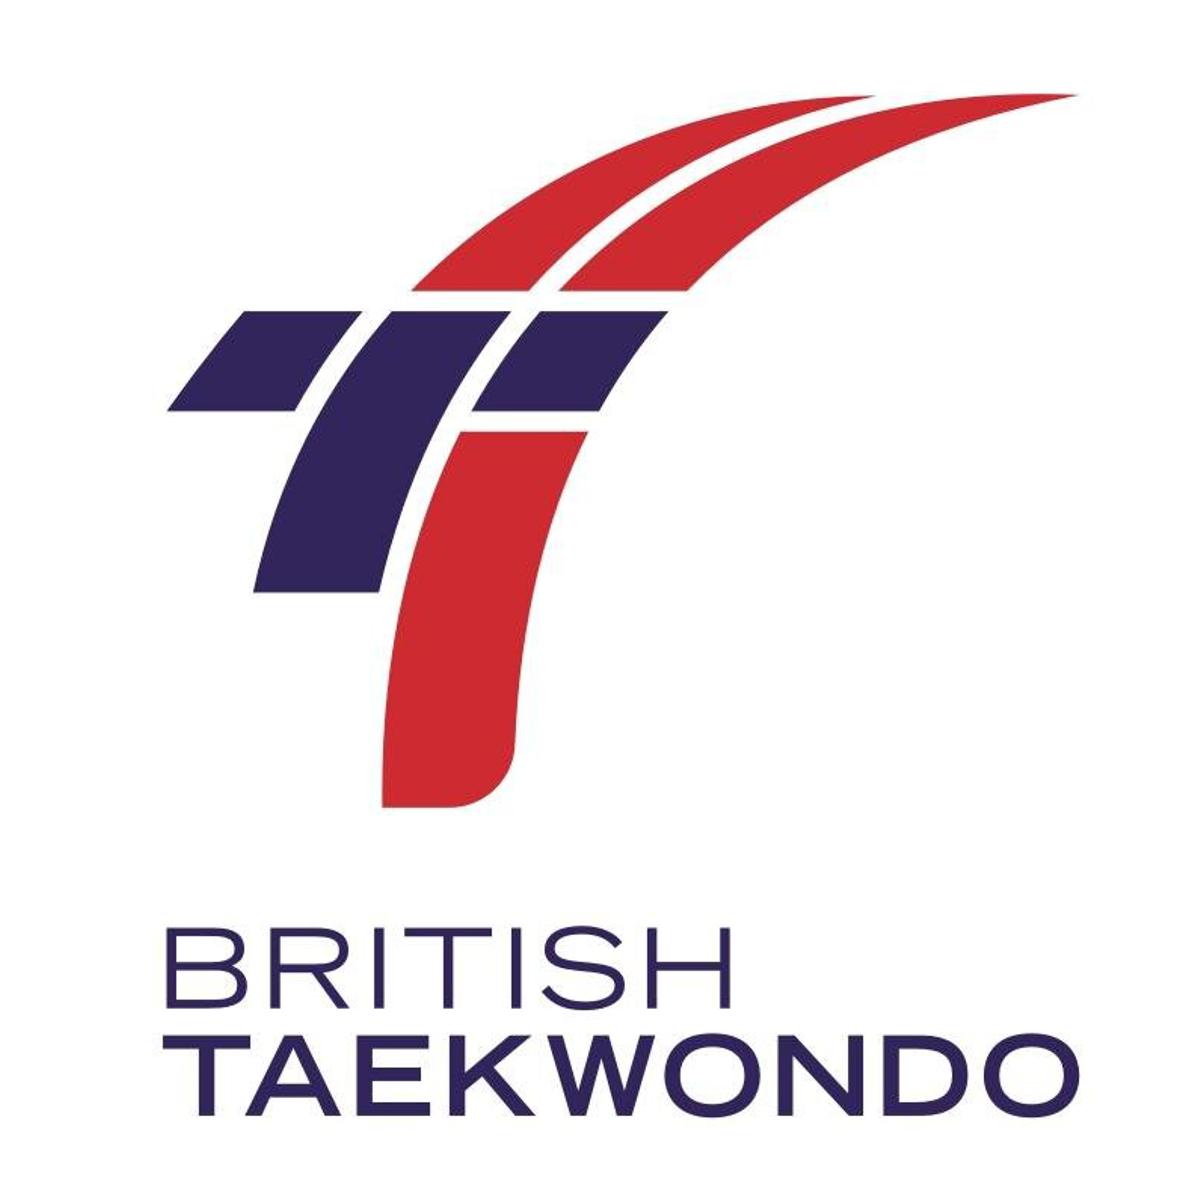 BRITISH TAEKWONDO LOGO PRINTING